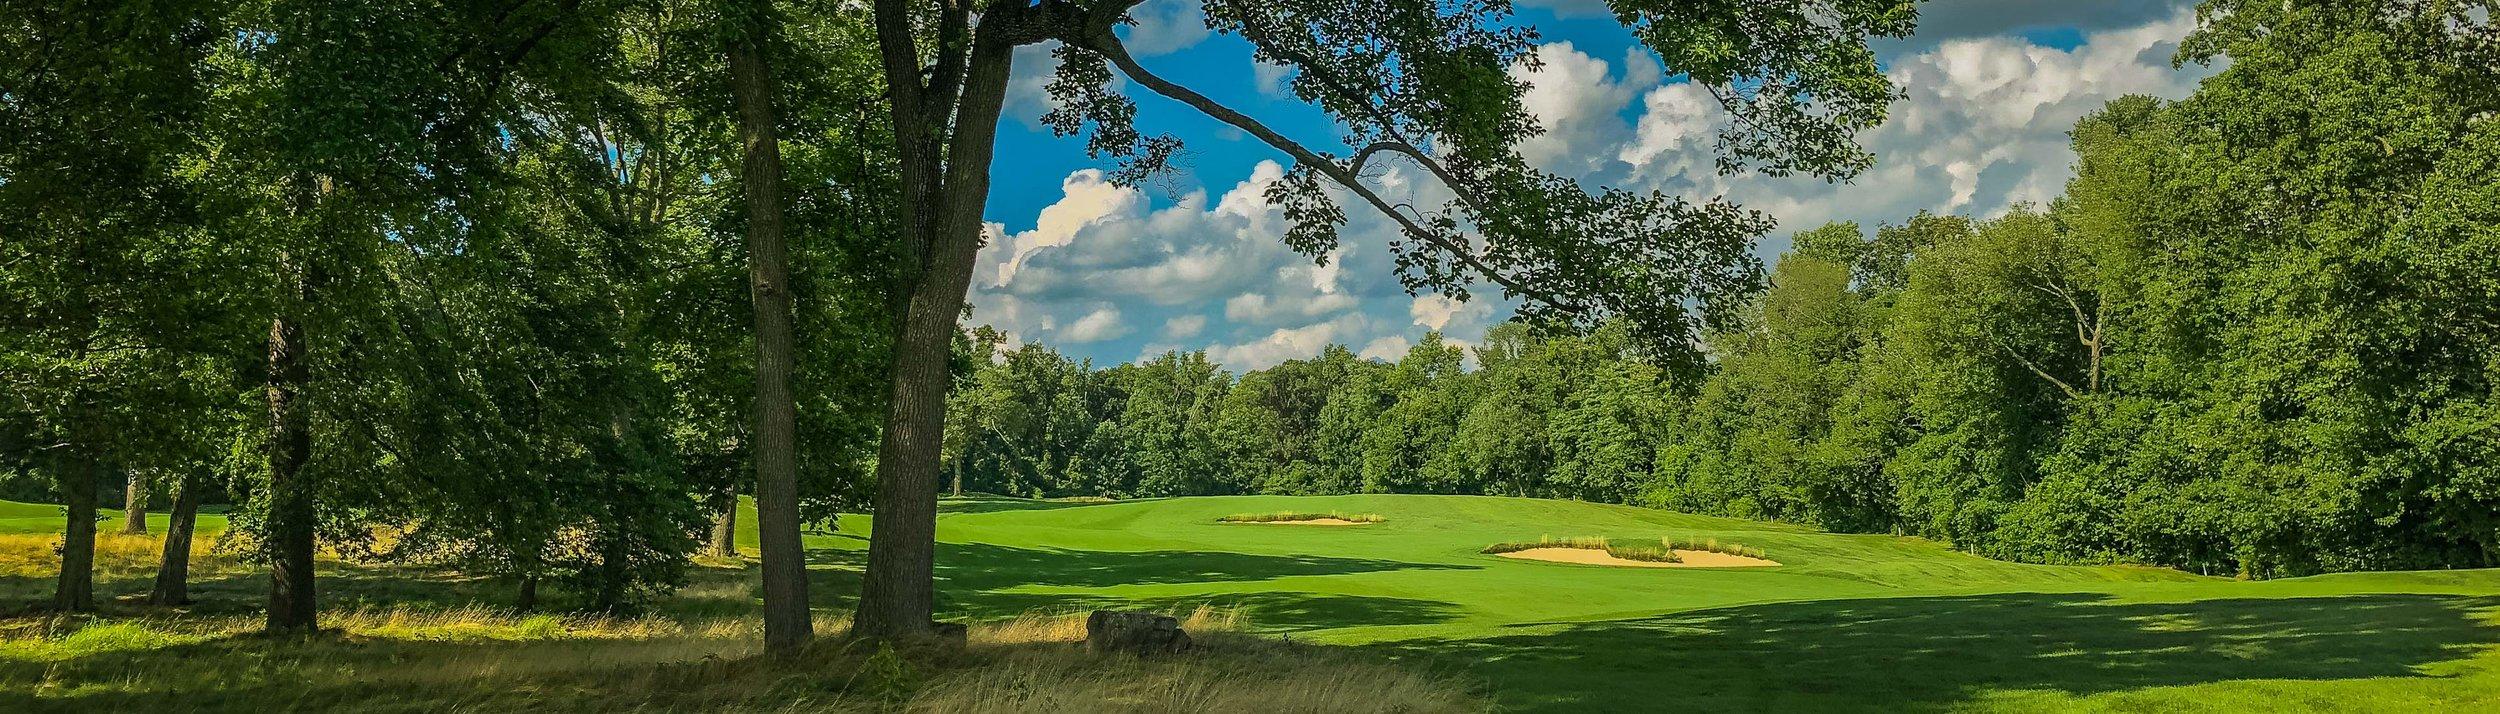 SCC 2018 Golf #6- HAP (4 of 7).jpg